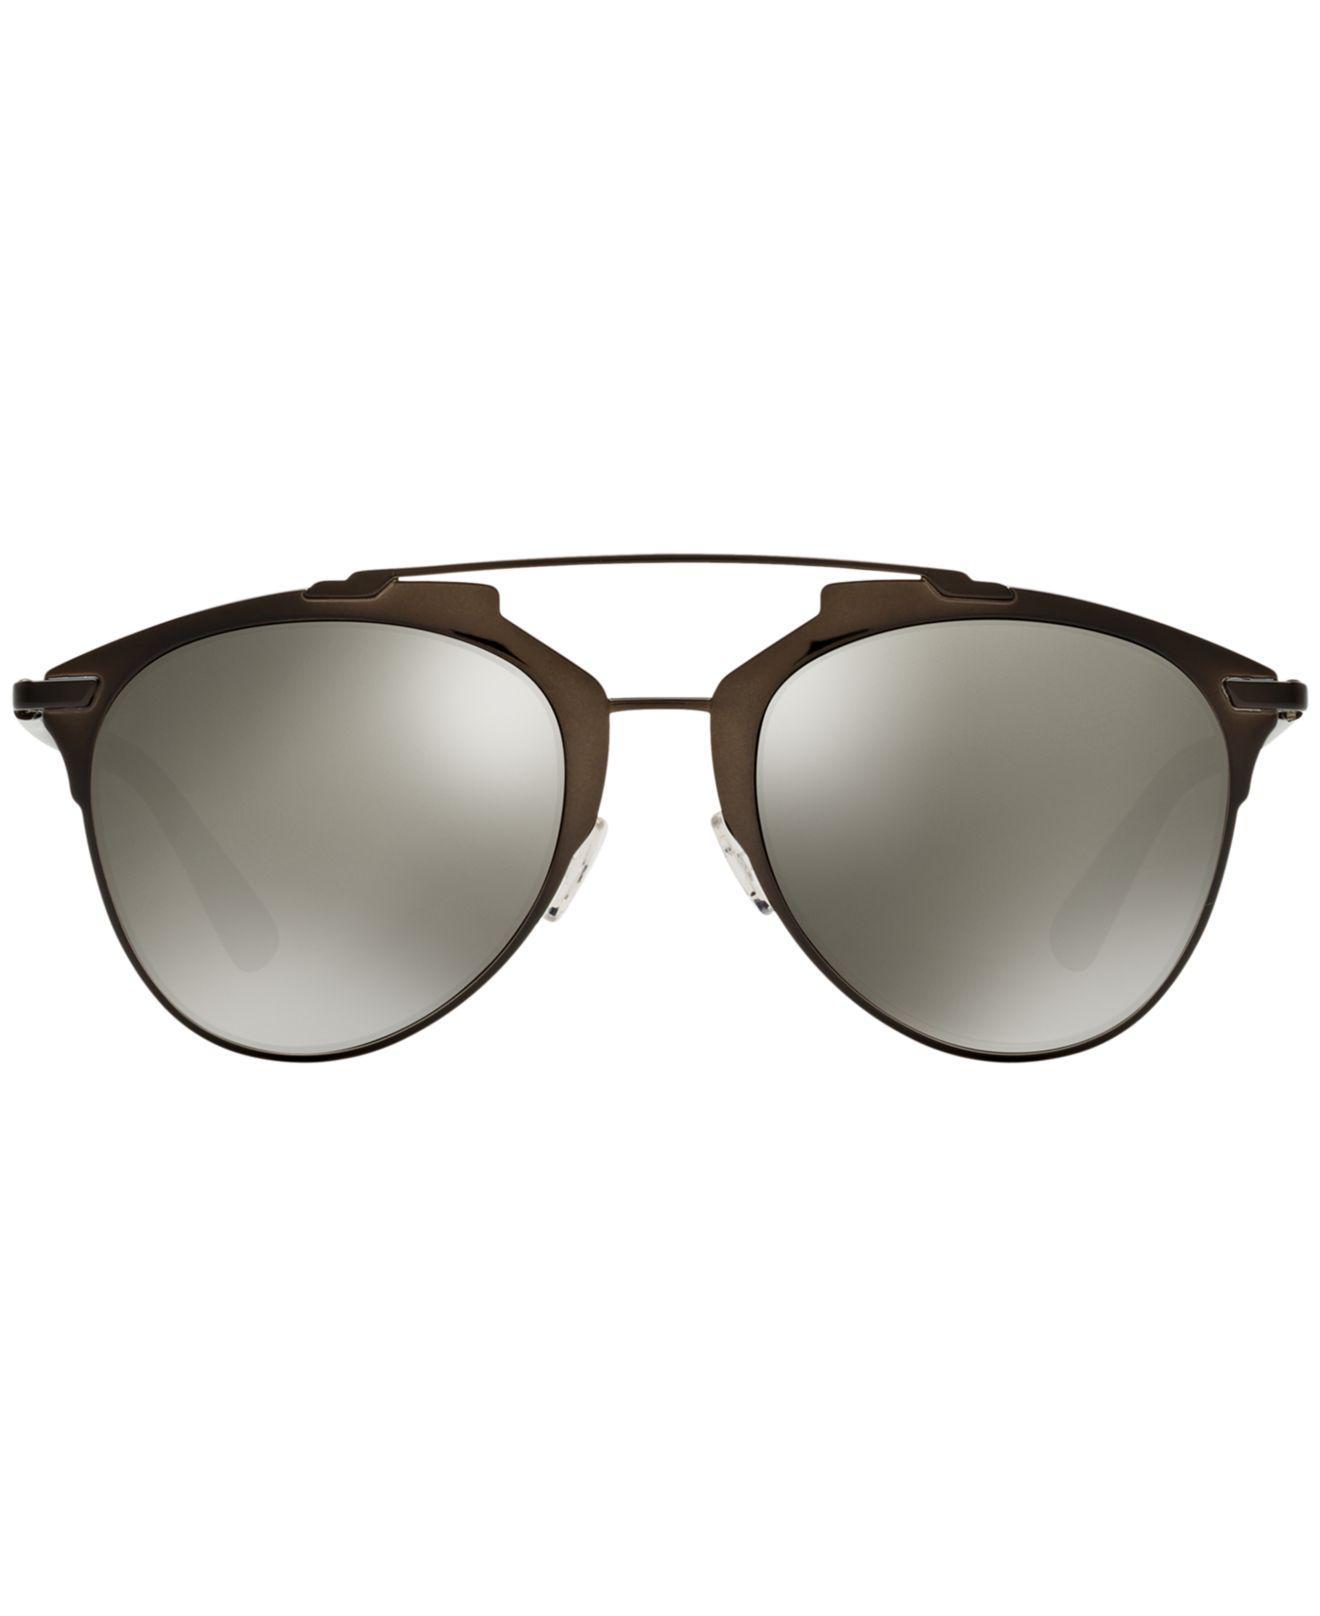 a83441c80e07 Dior Reflected Aviator Sunglasses in Black - Save 61% - Lyst